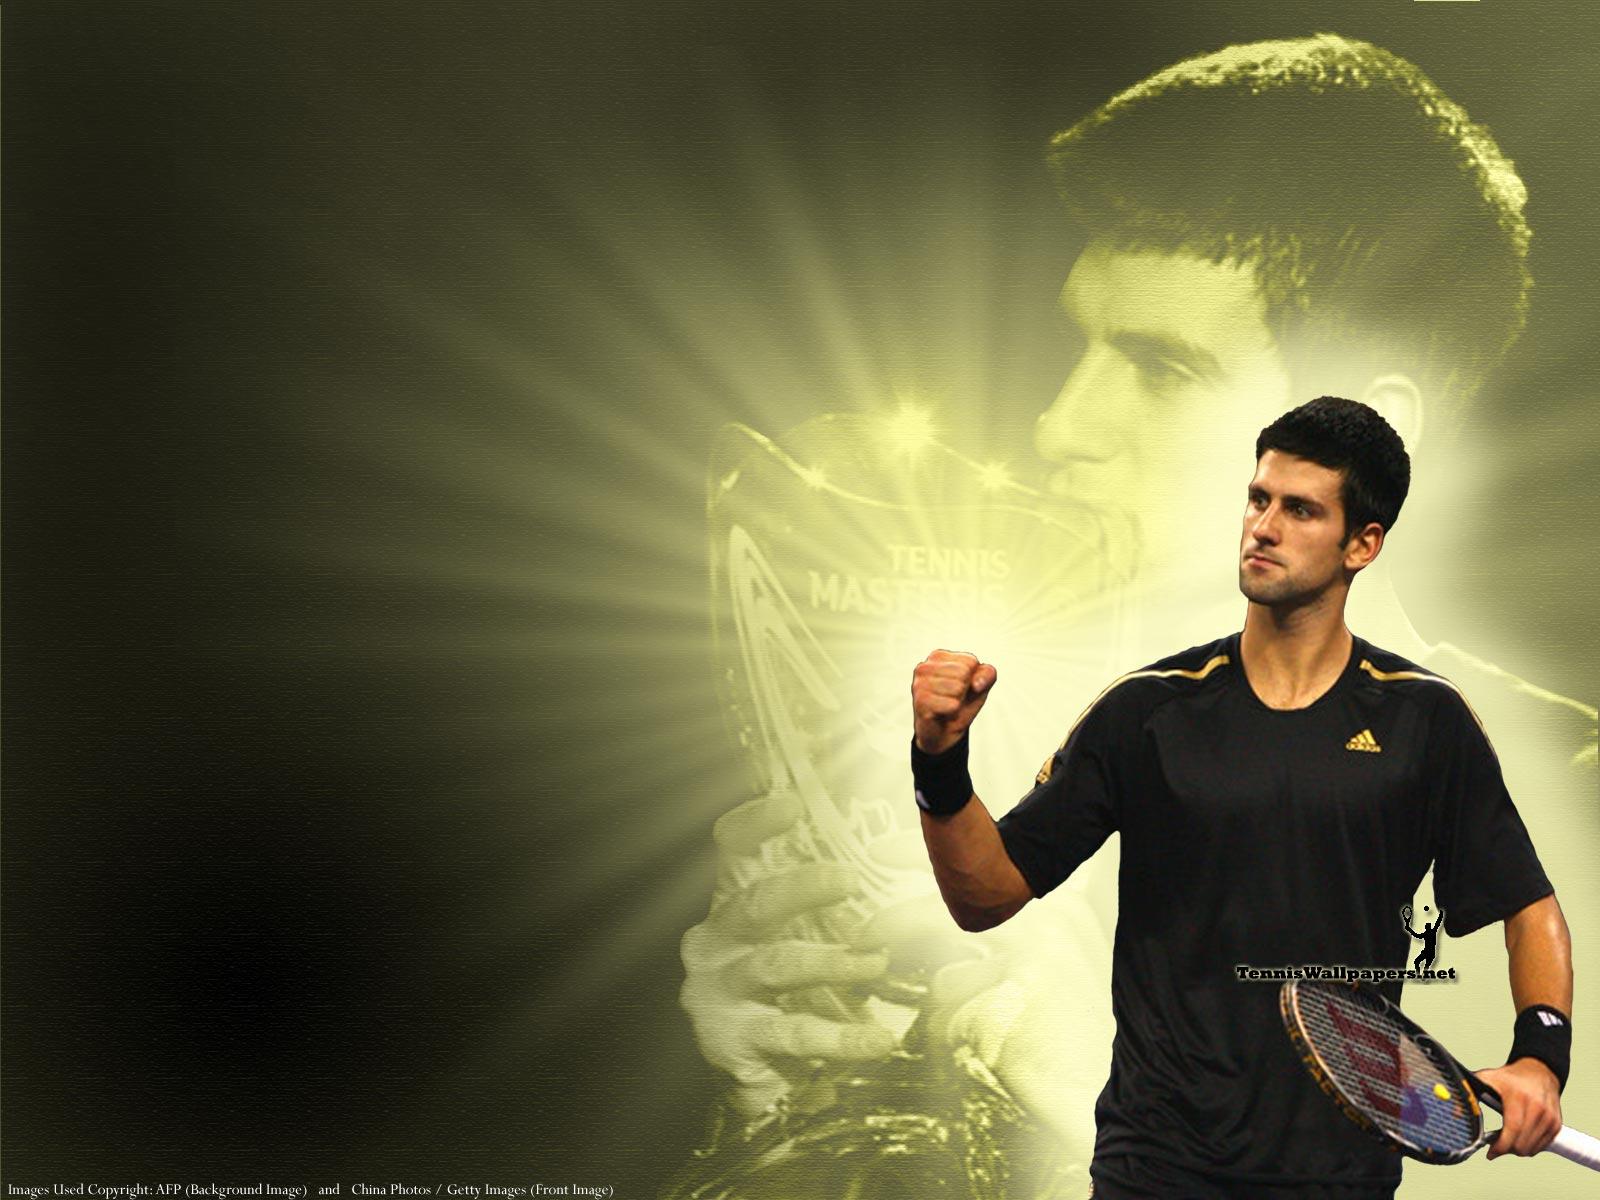 TENNIS PLAYERS WALLPAPERS Novak Djokovic Wallpapers 1600x1200